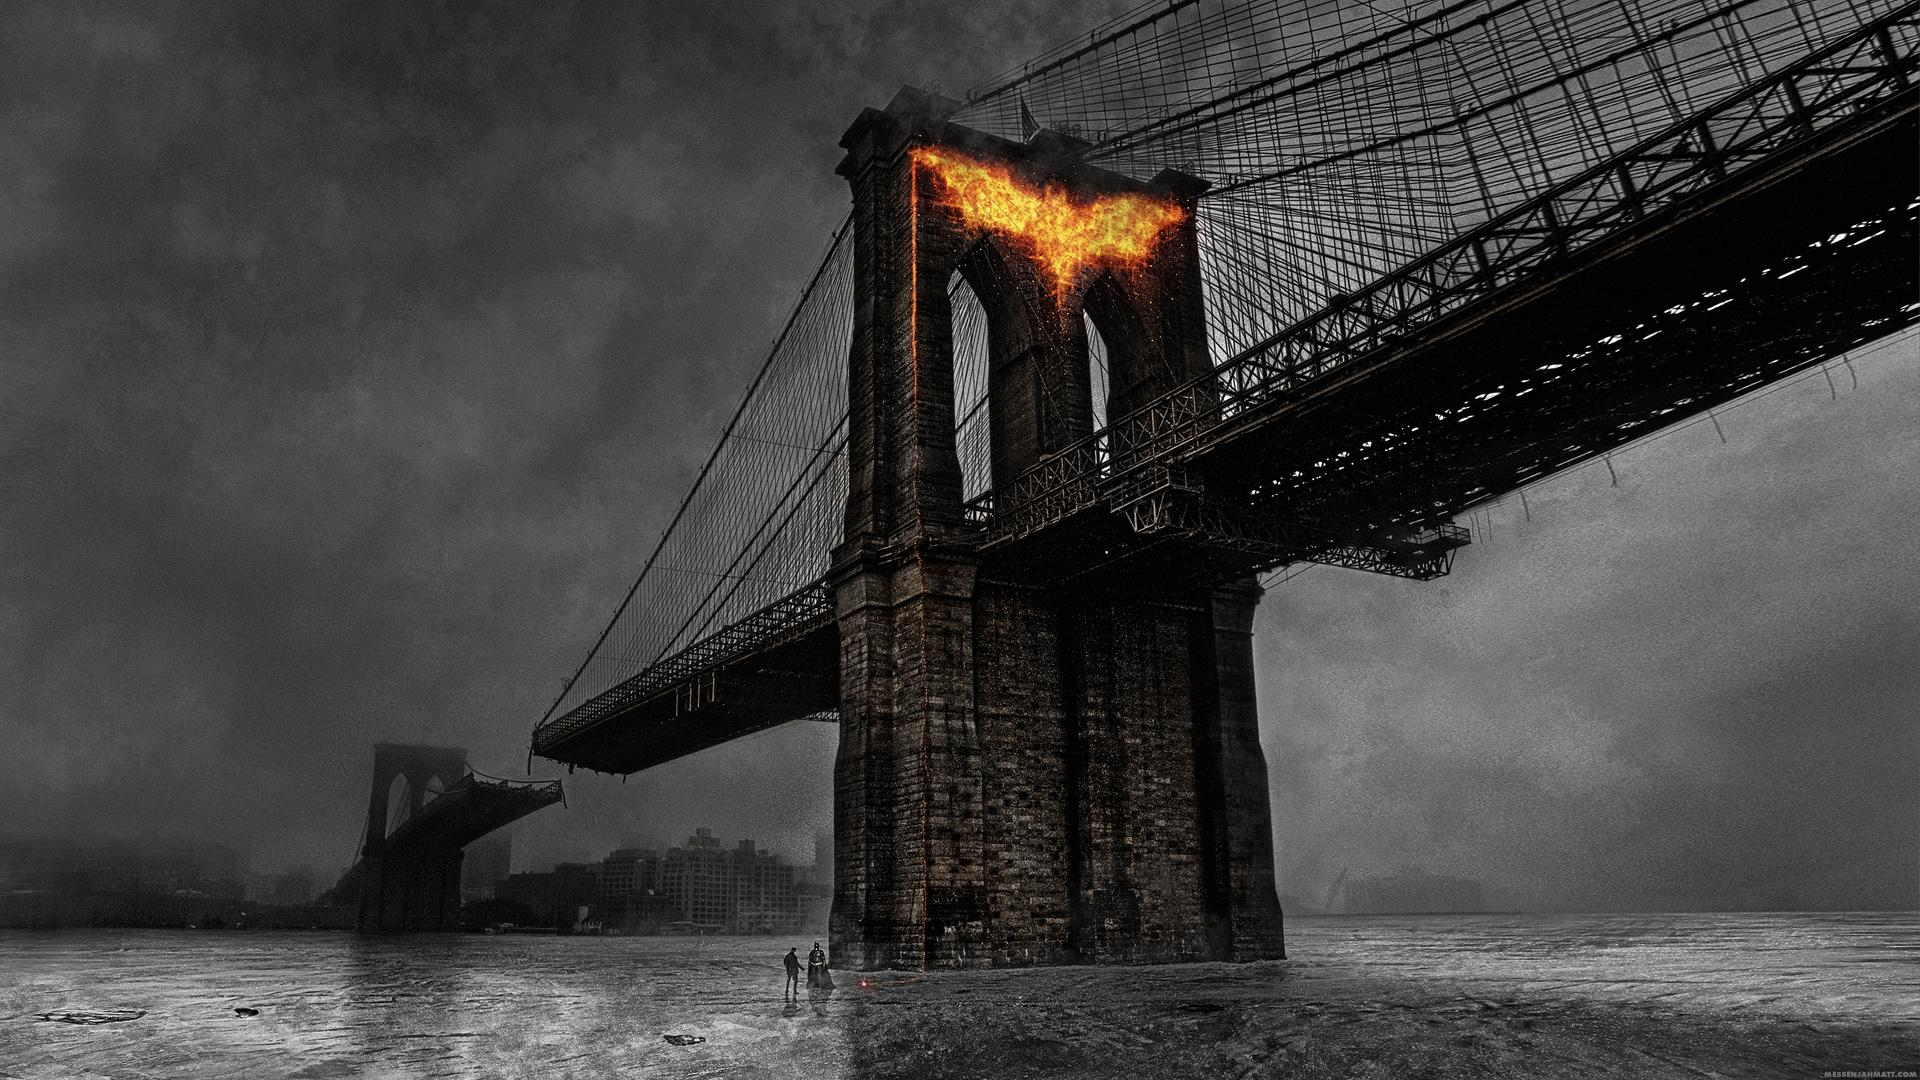 TDK - The Dark Knight Photo (33681707) - Fanpop